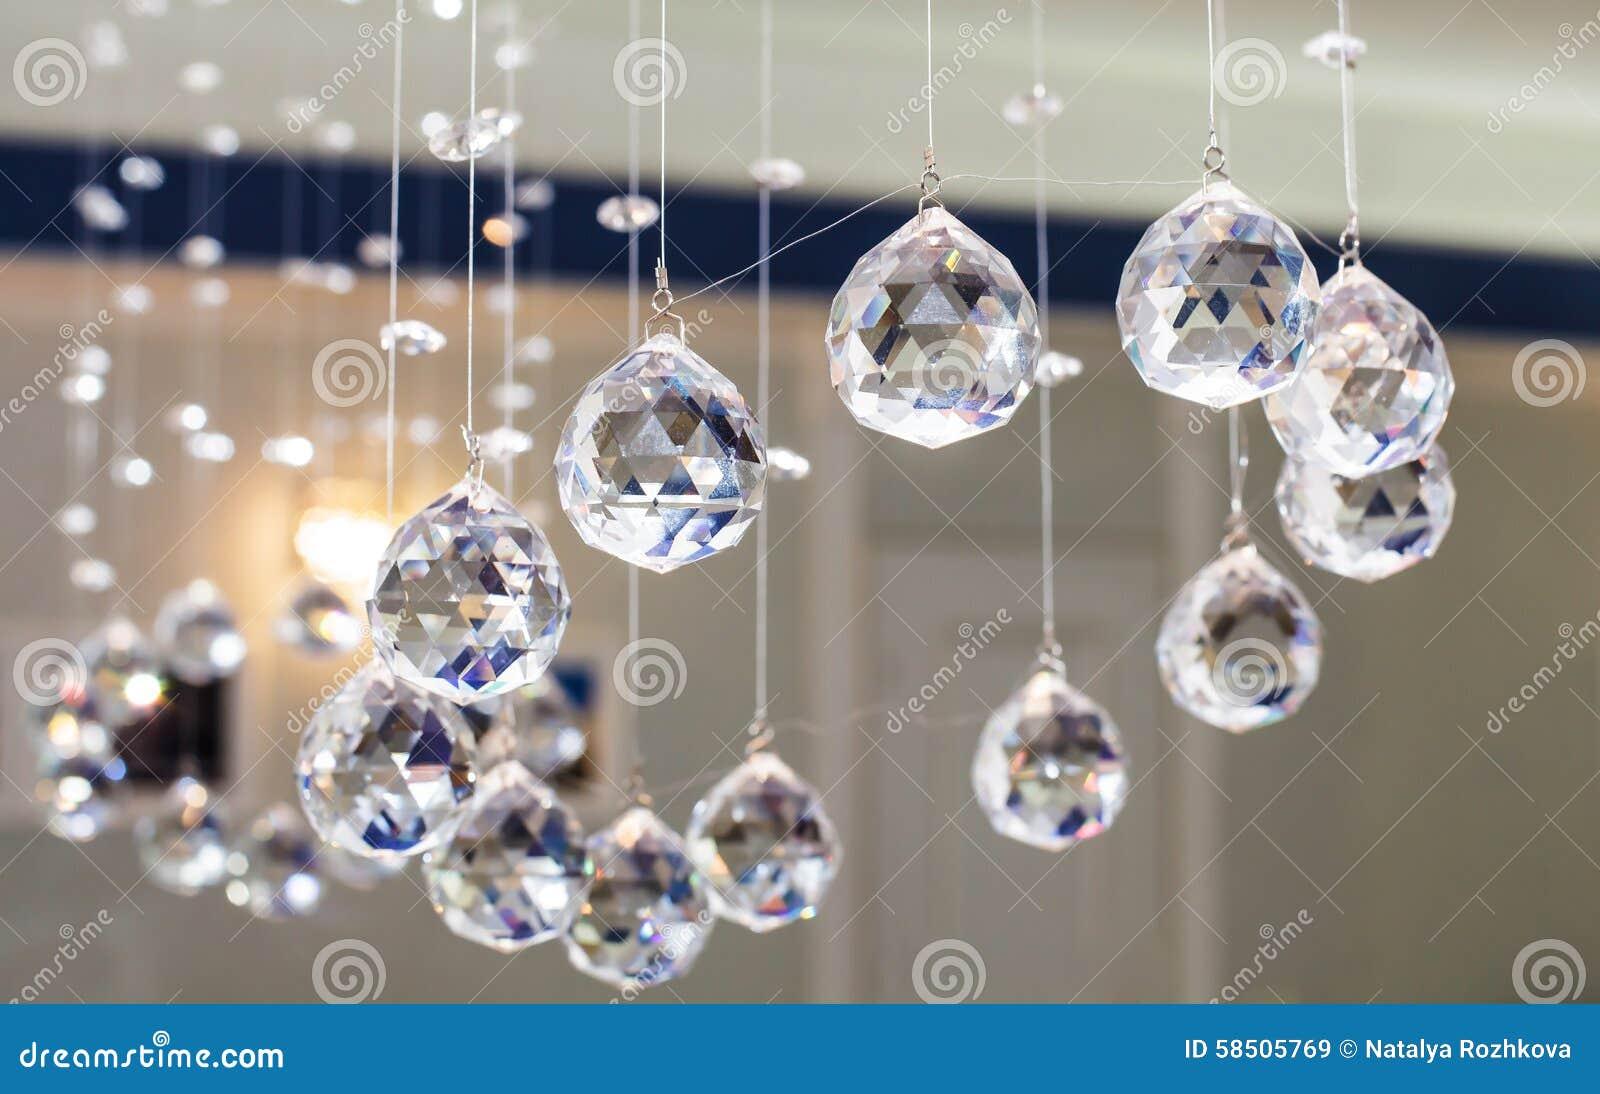 Download Balls Faceted Glass. Decorative. Stock Illustration - Illustration of christmas, balls: 58505769